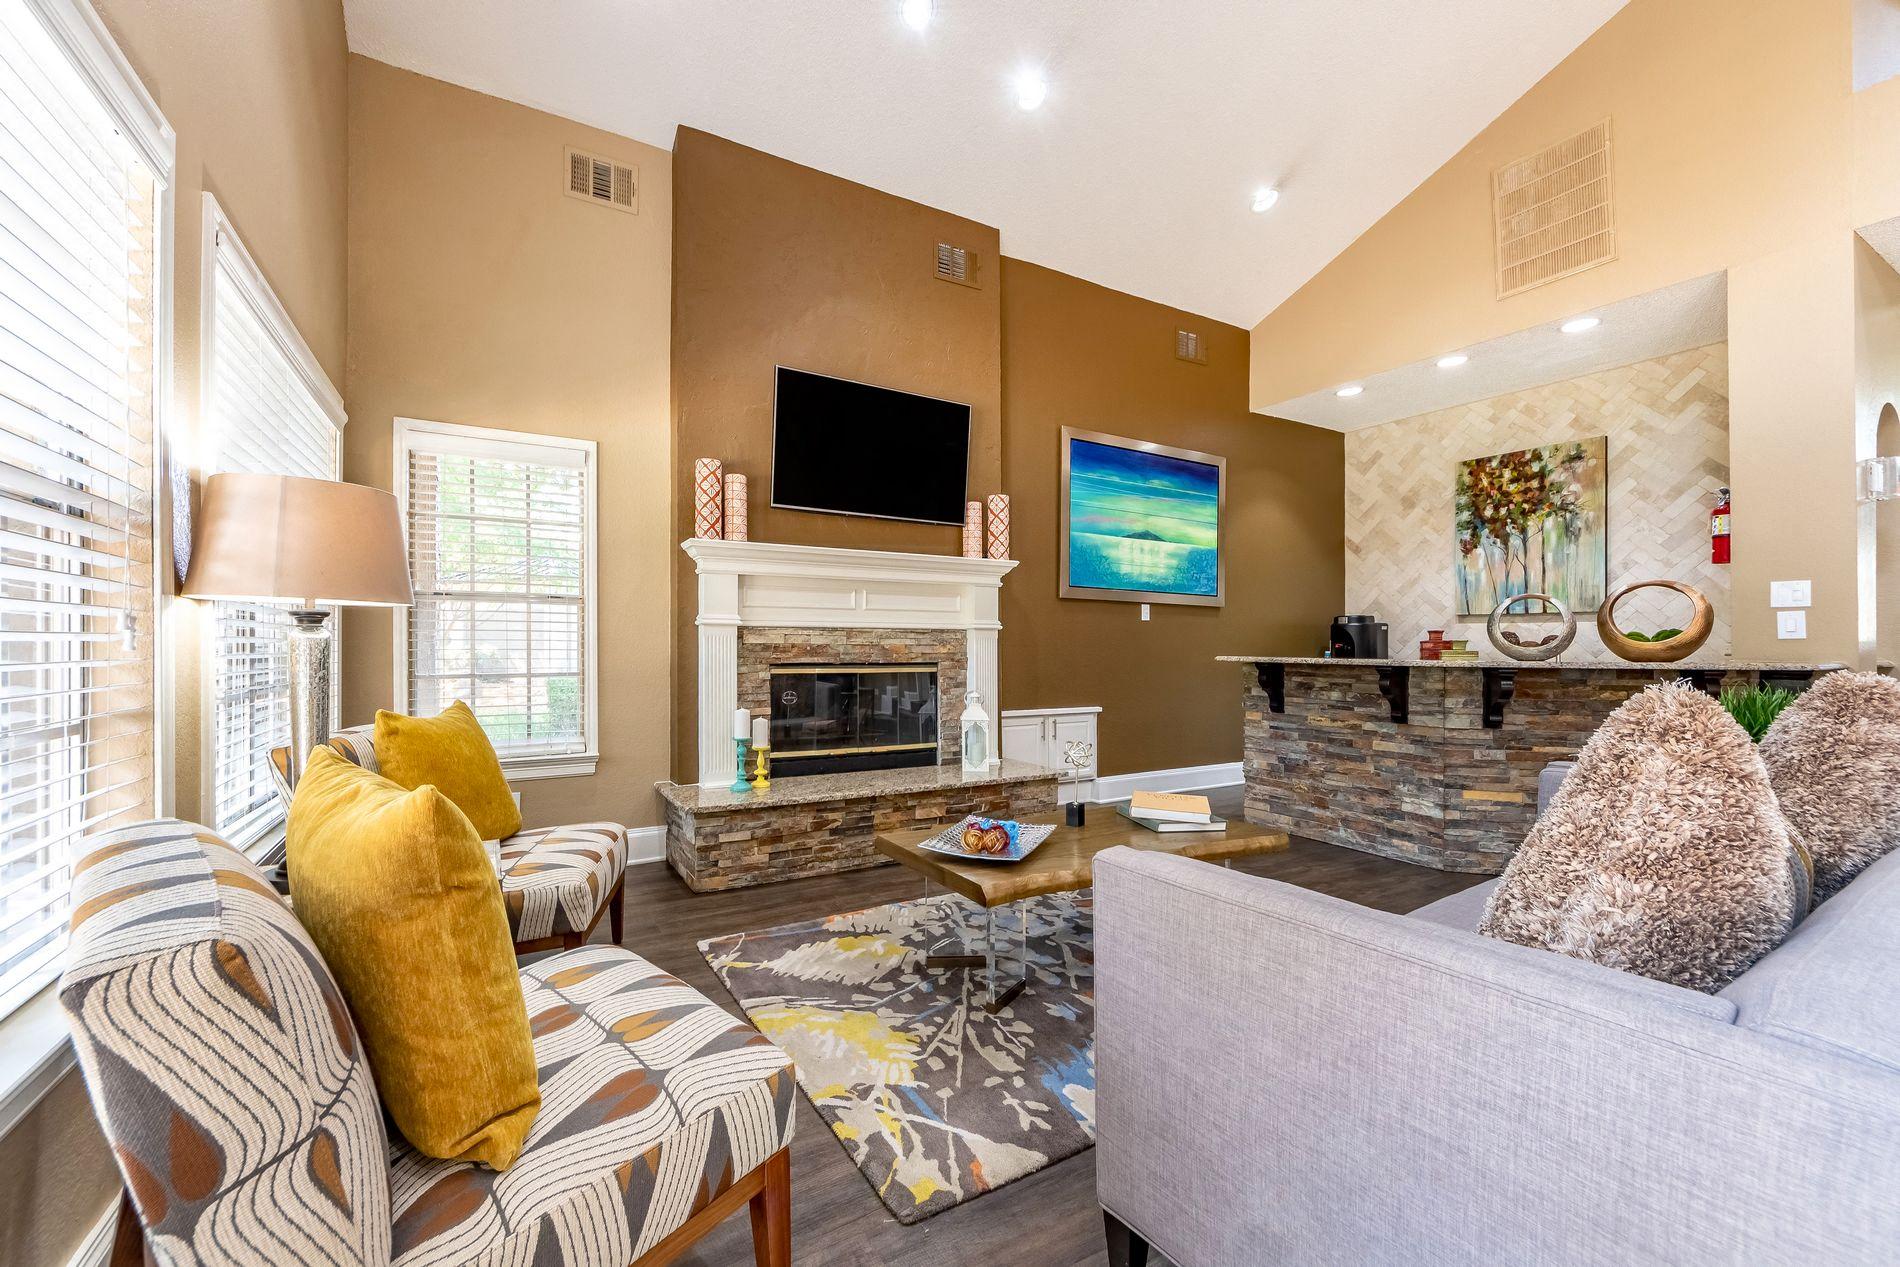 Leasing Office Interior at La Costa Apartments in Plano, Texas, TX